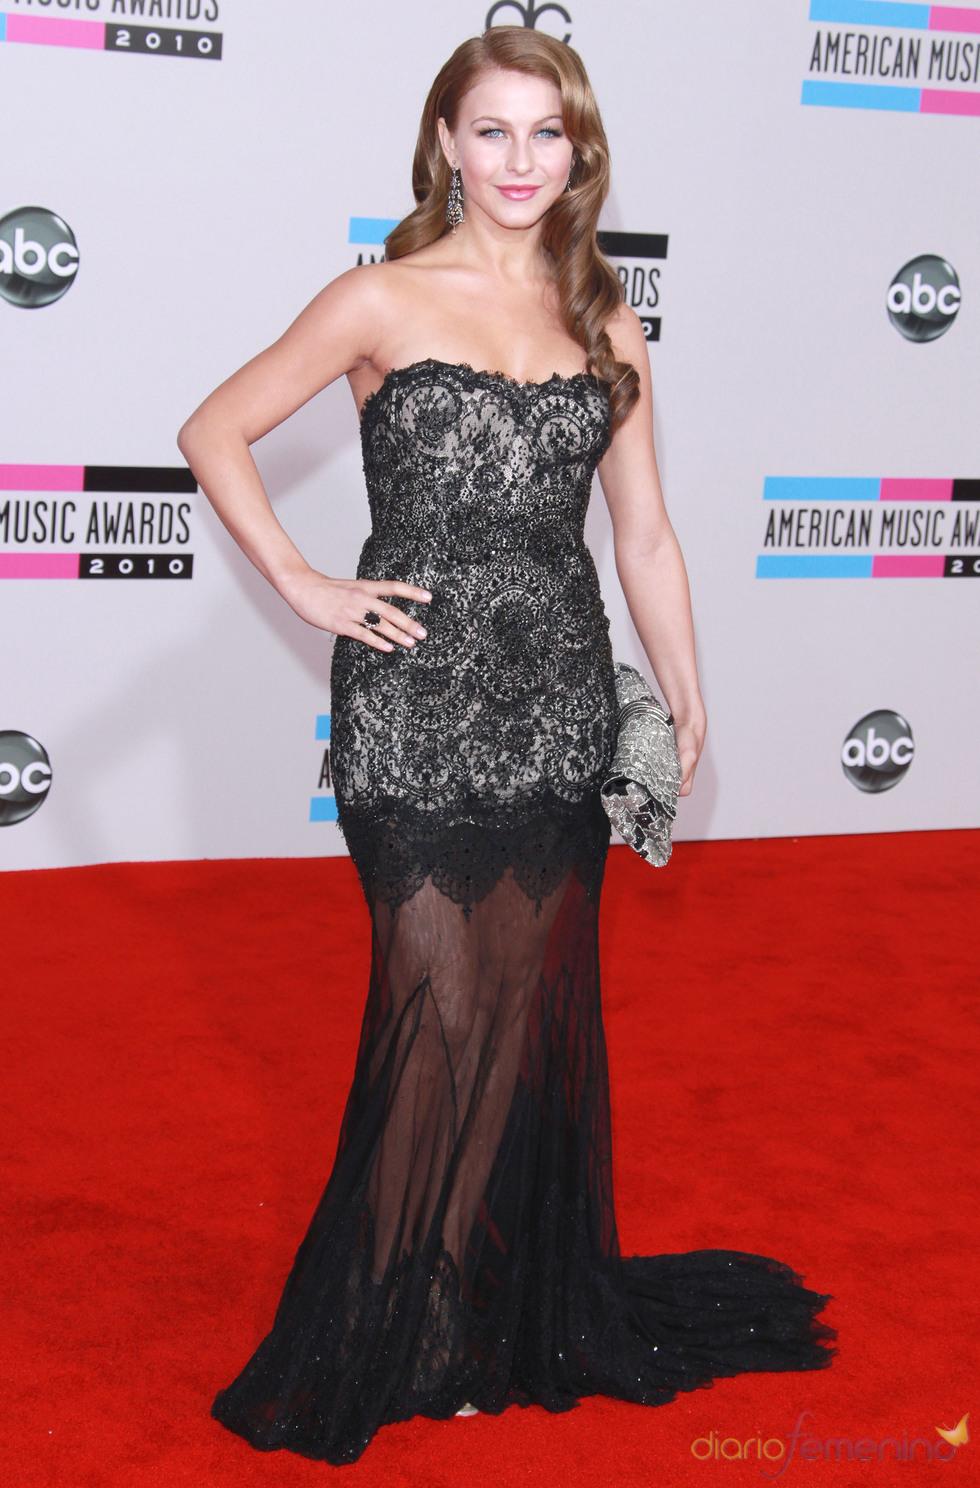 Julianne Hough en los American Music Awards 2010